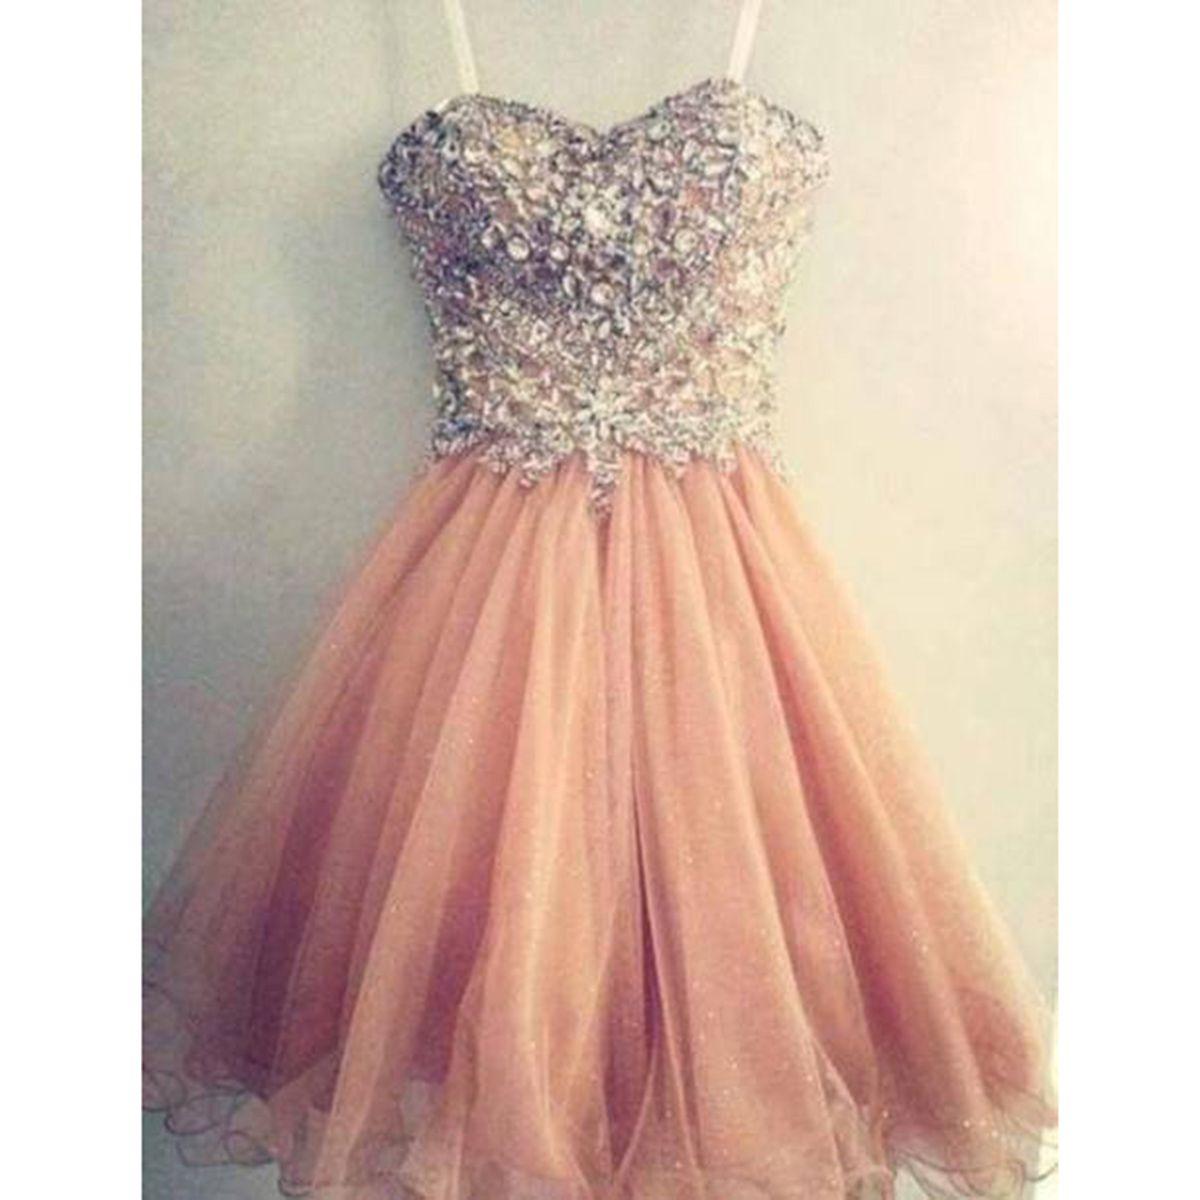 Images for ue cute short dresses tumblr dresses pinterest